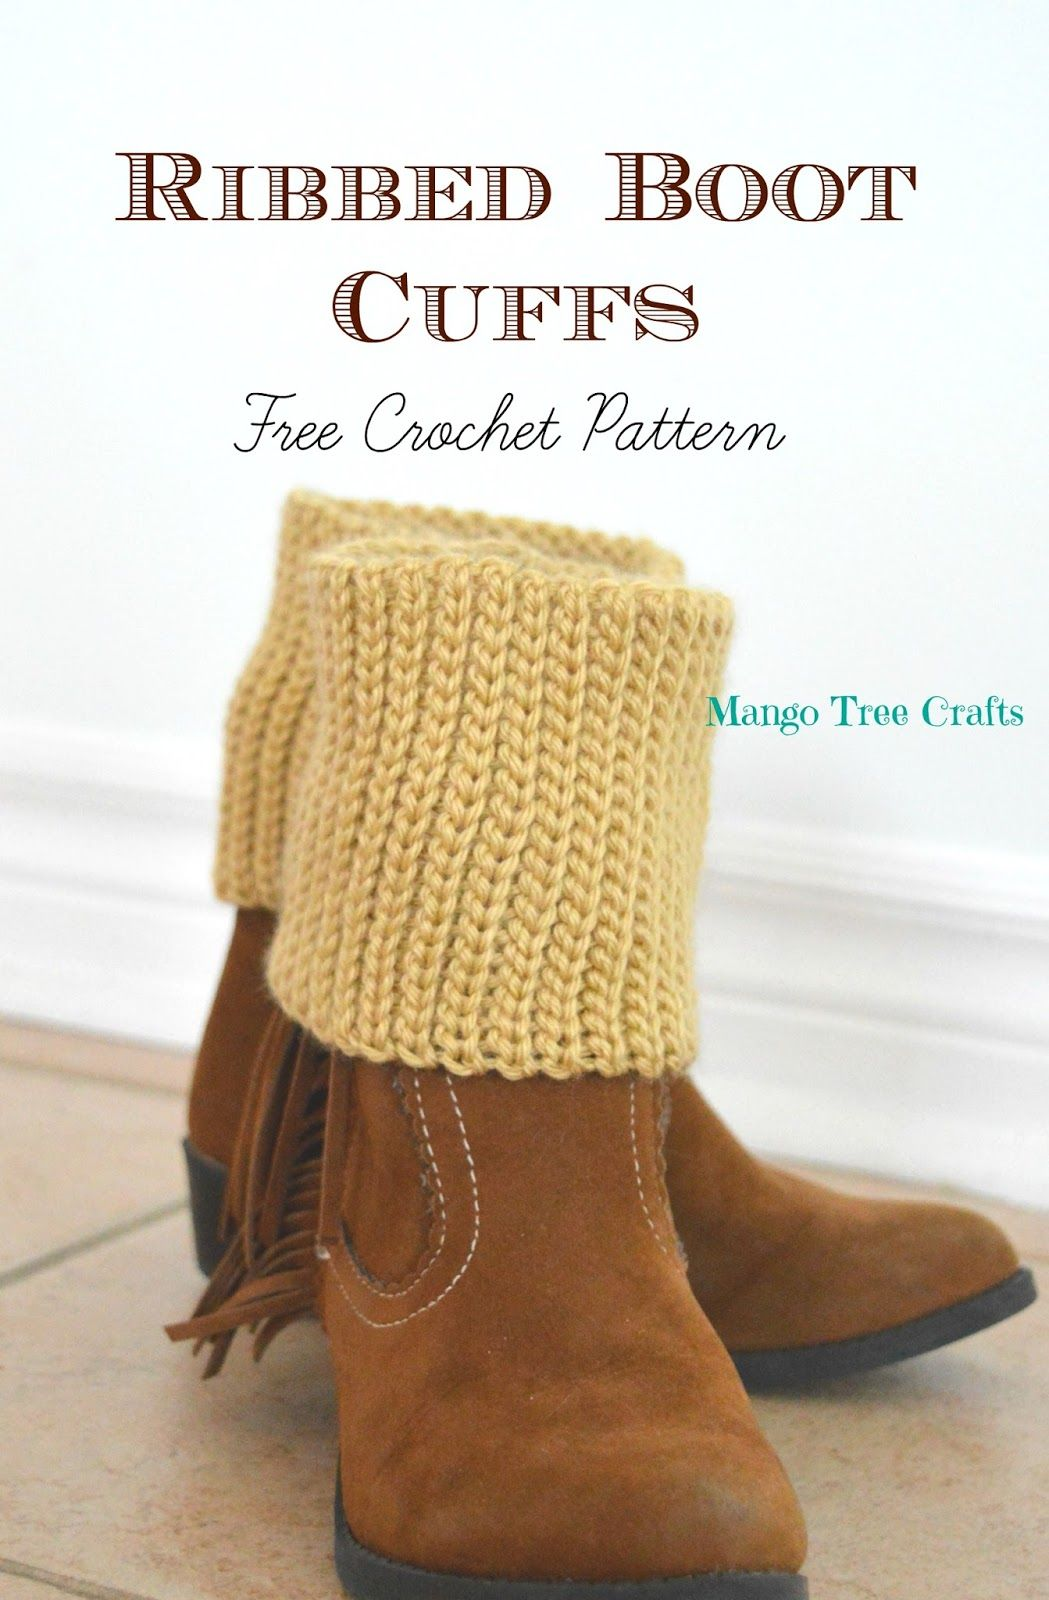 Ribbed boot cuffs free crochet pattern | Craft Ideas | Pinterest ...